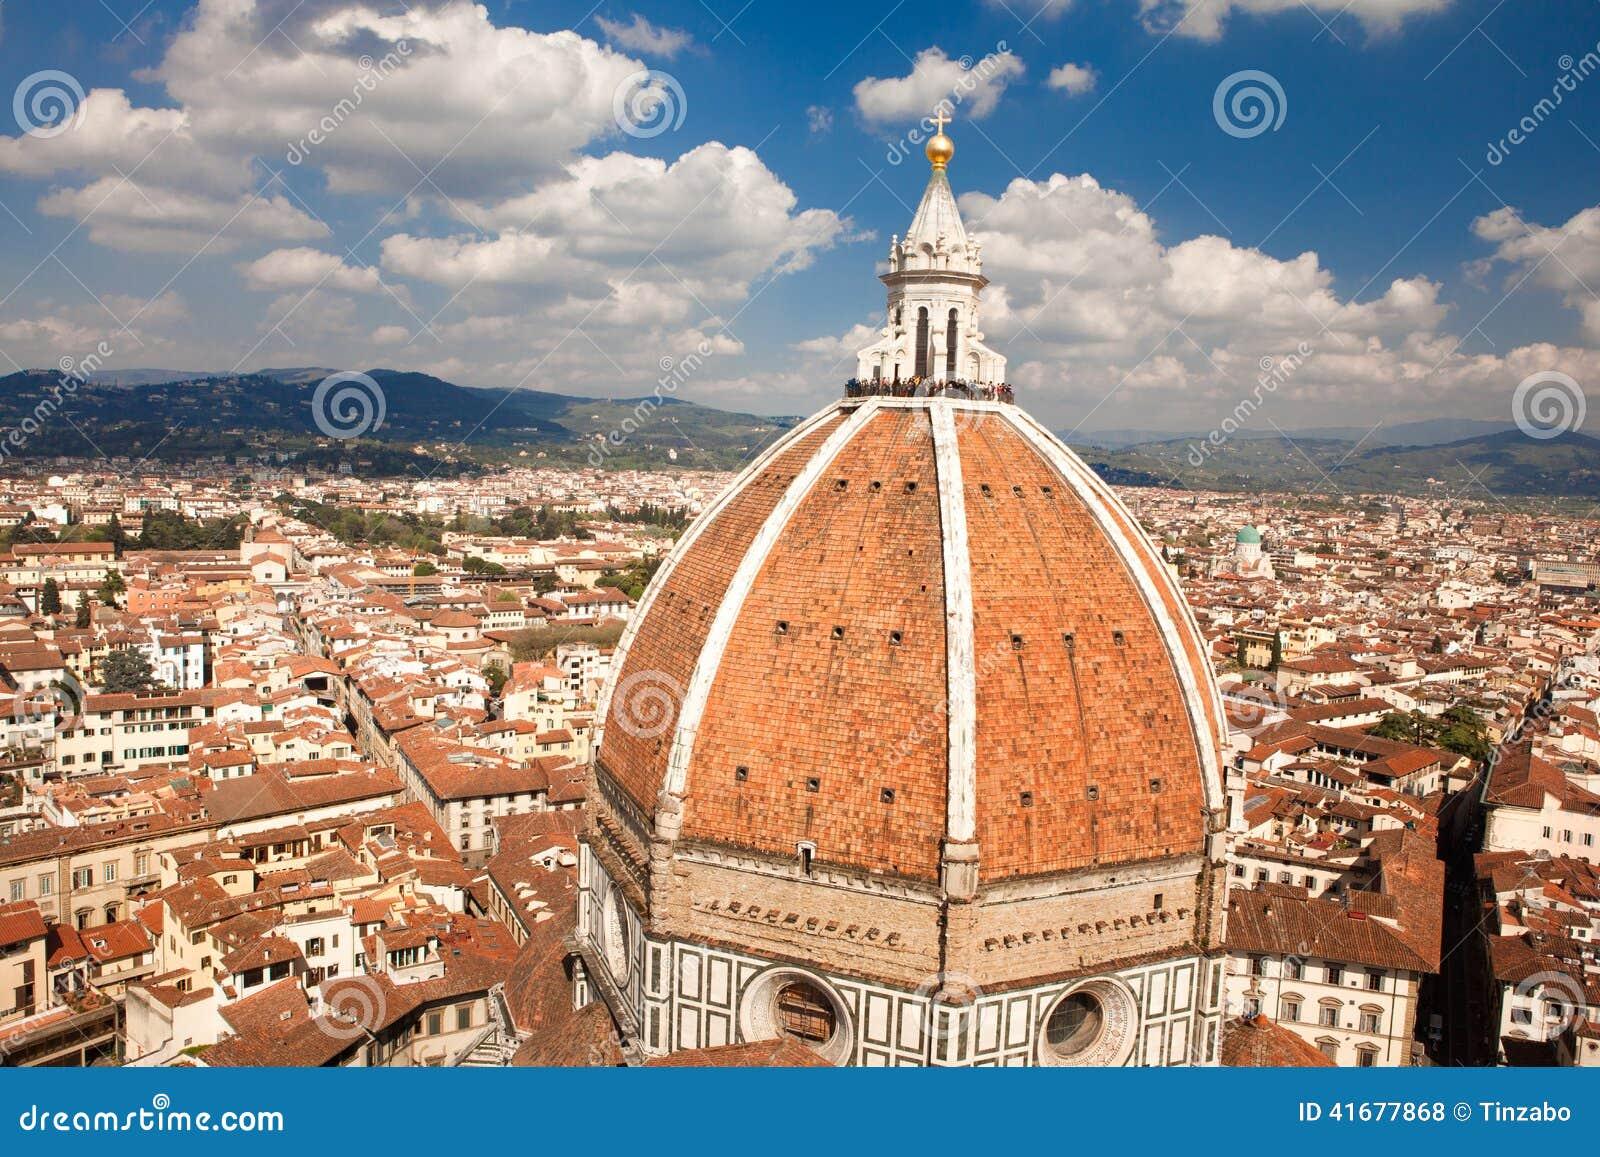 Florence, Italië, Florence, Italië, Florence Cathedral, Brunnaleski-koepel, cityscape de koepel van Fr Brunnaleski, cityscape van